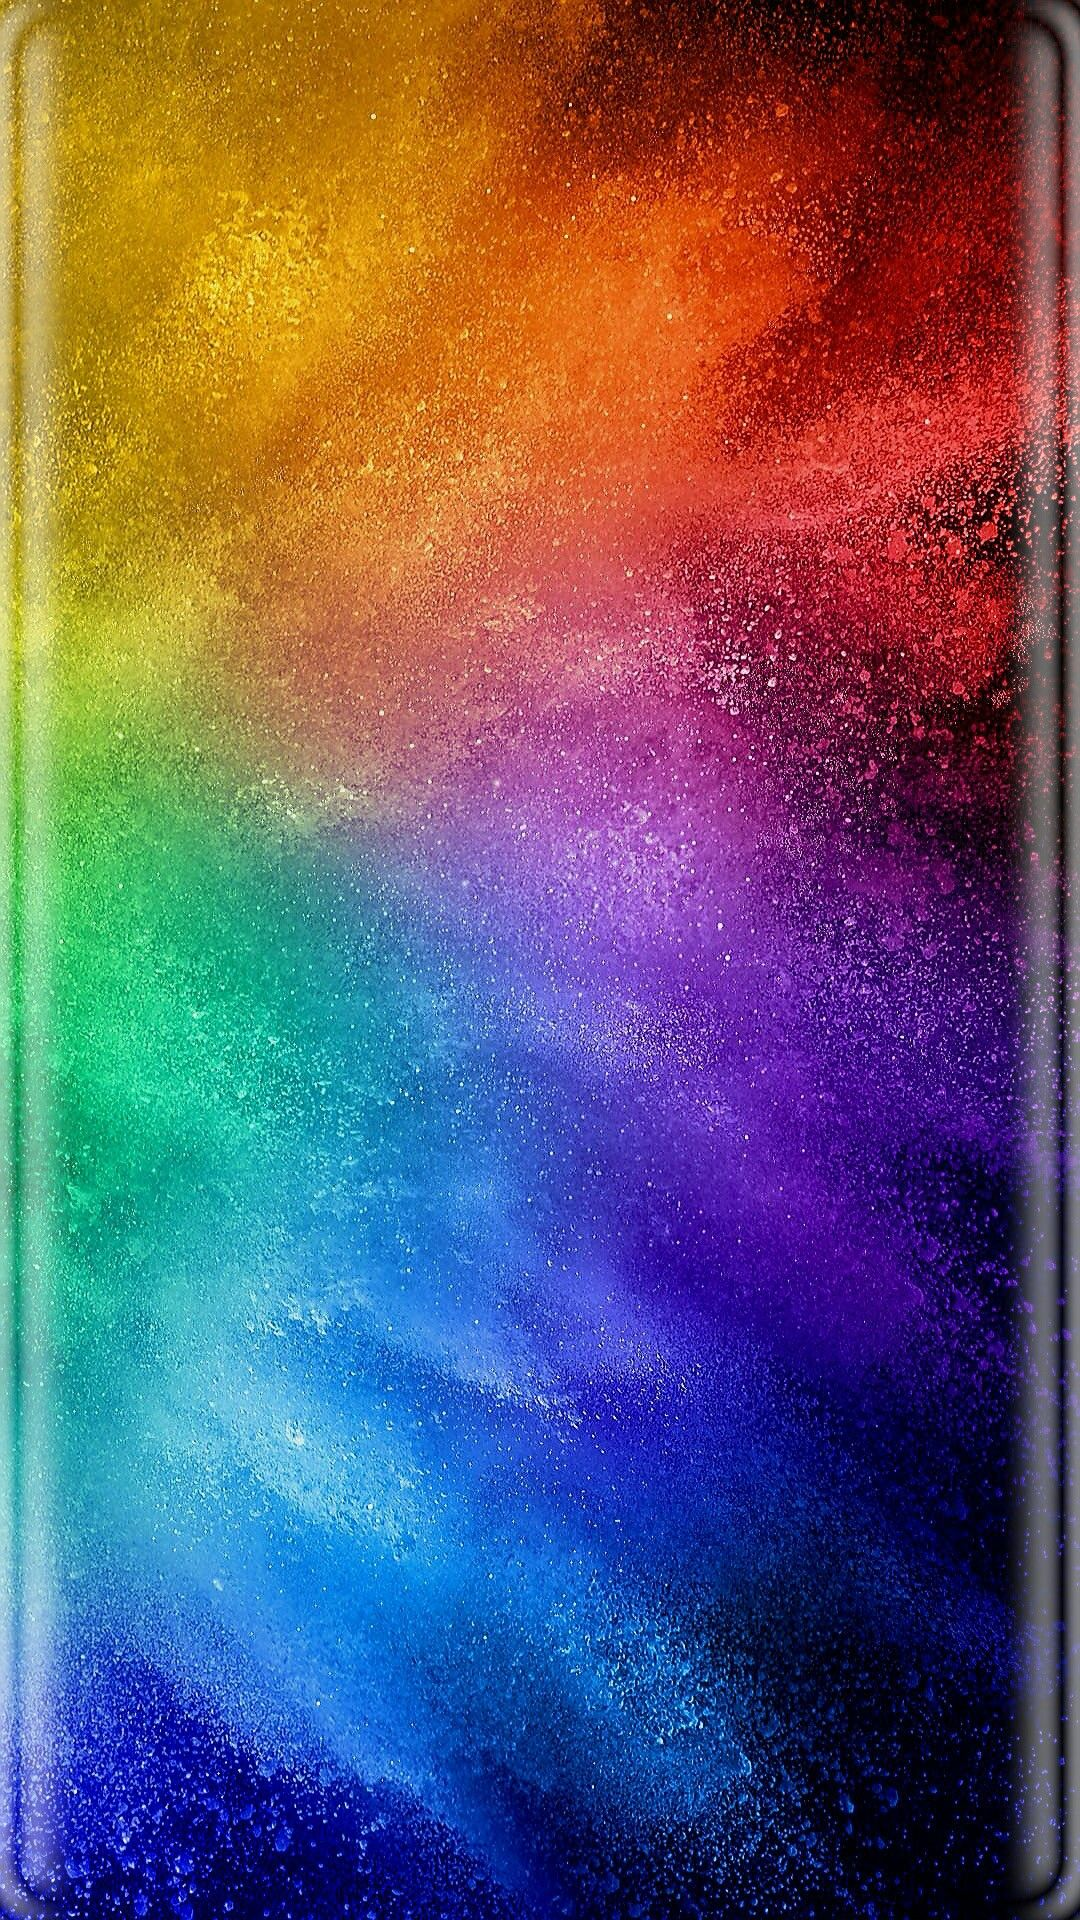 Rainbow Bursts Wallpaper Sfondi per telefono, Sfondi per